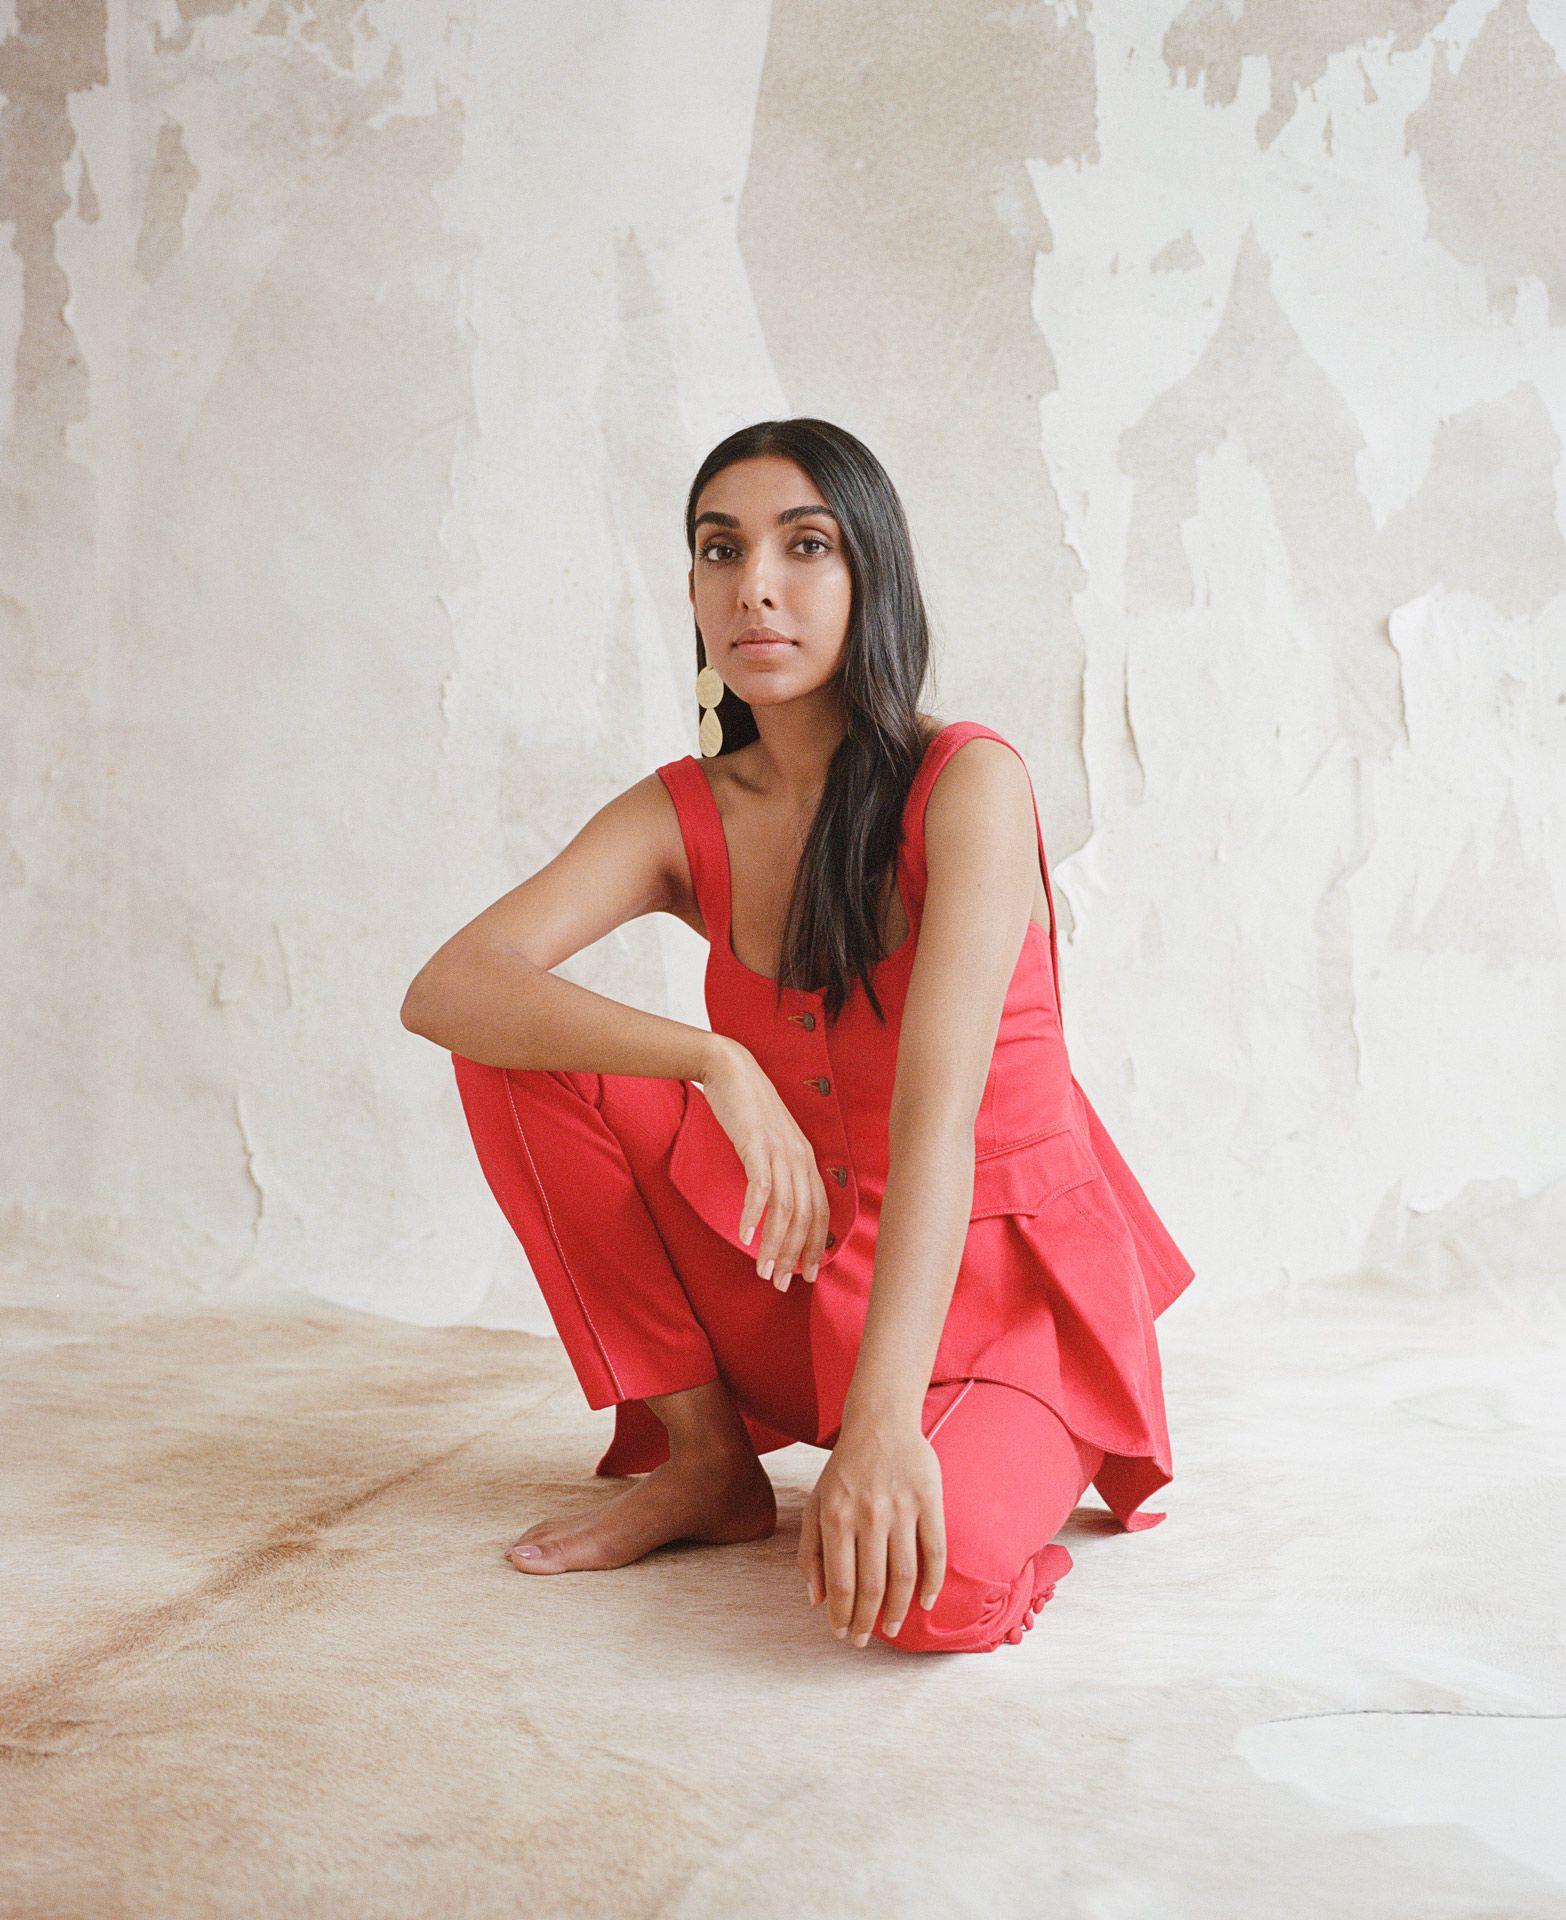 writer Rupi Kaur wearing red ensemble looking at camera by Oumayma B Tanfous for Vogue Espana